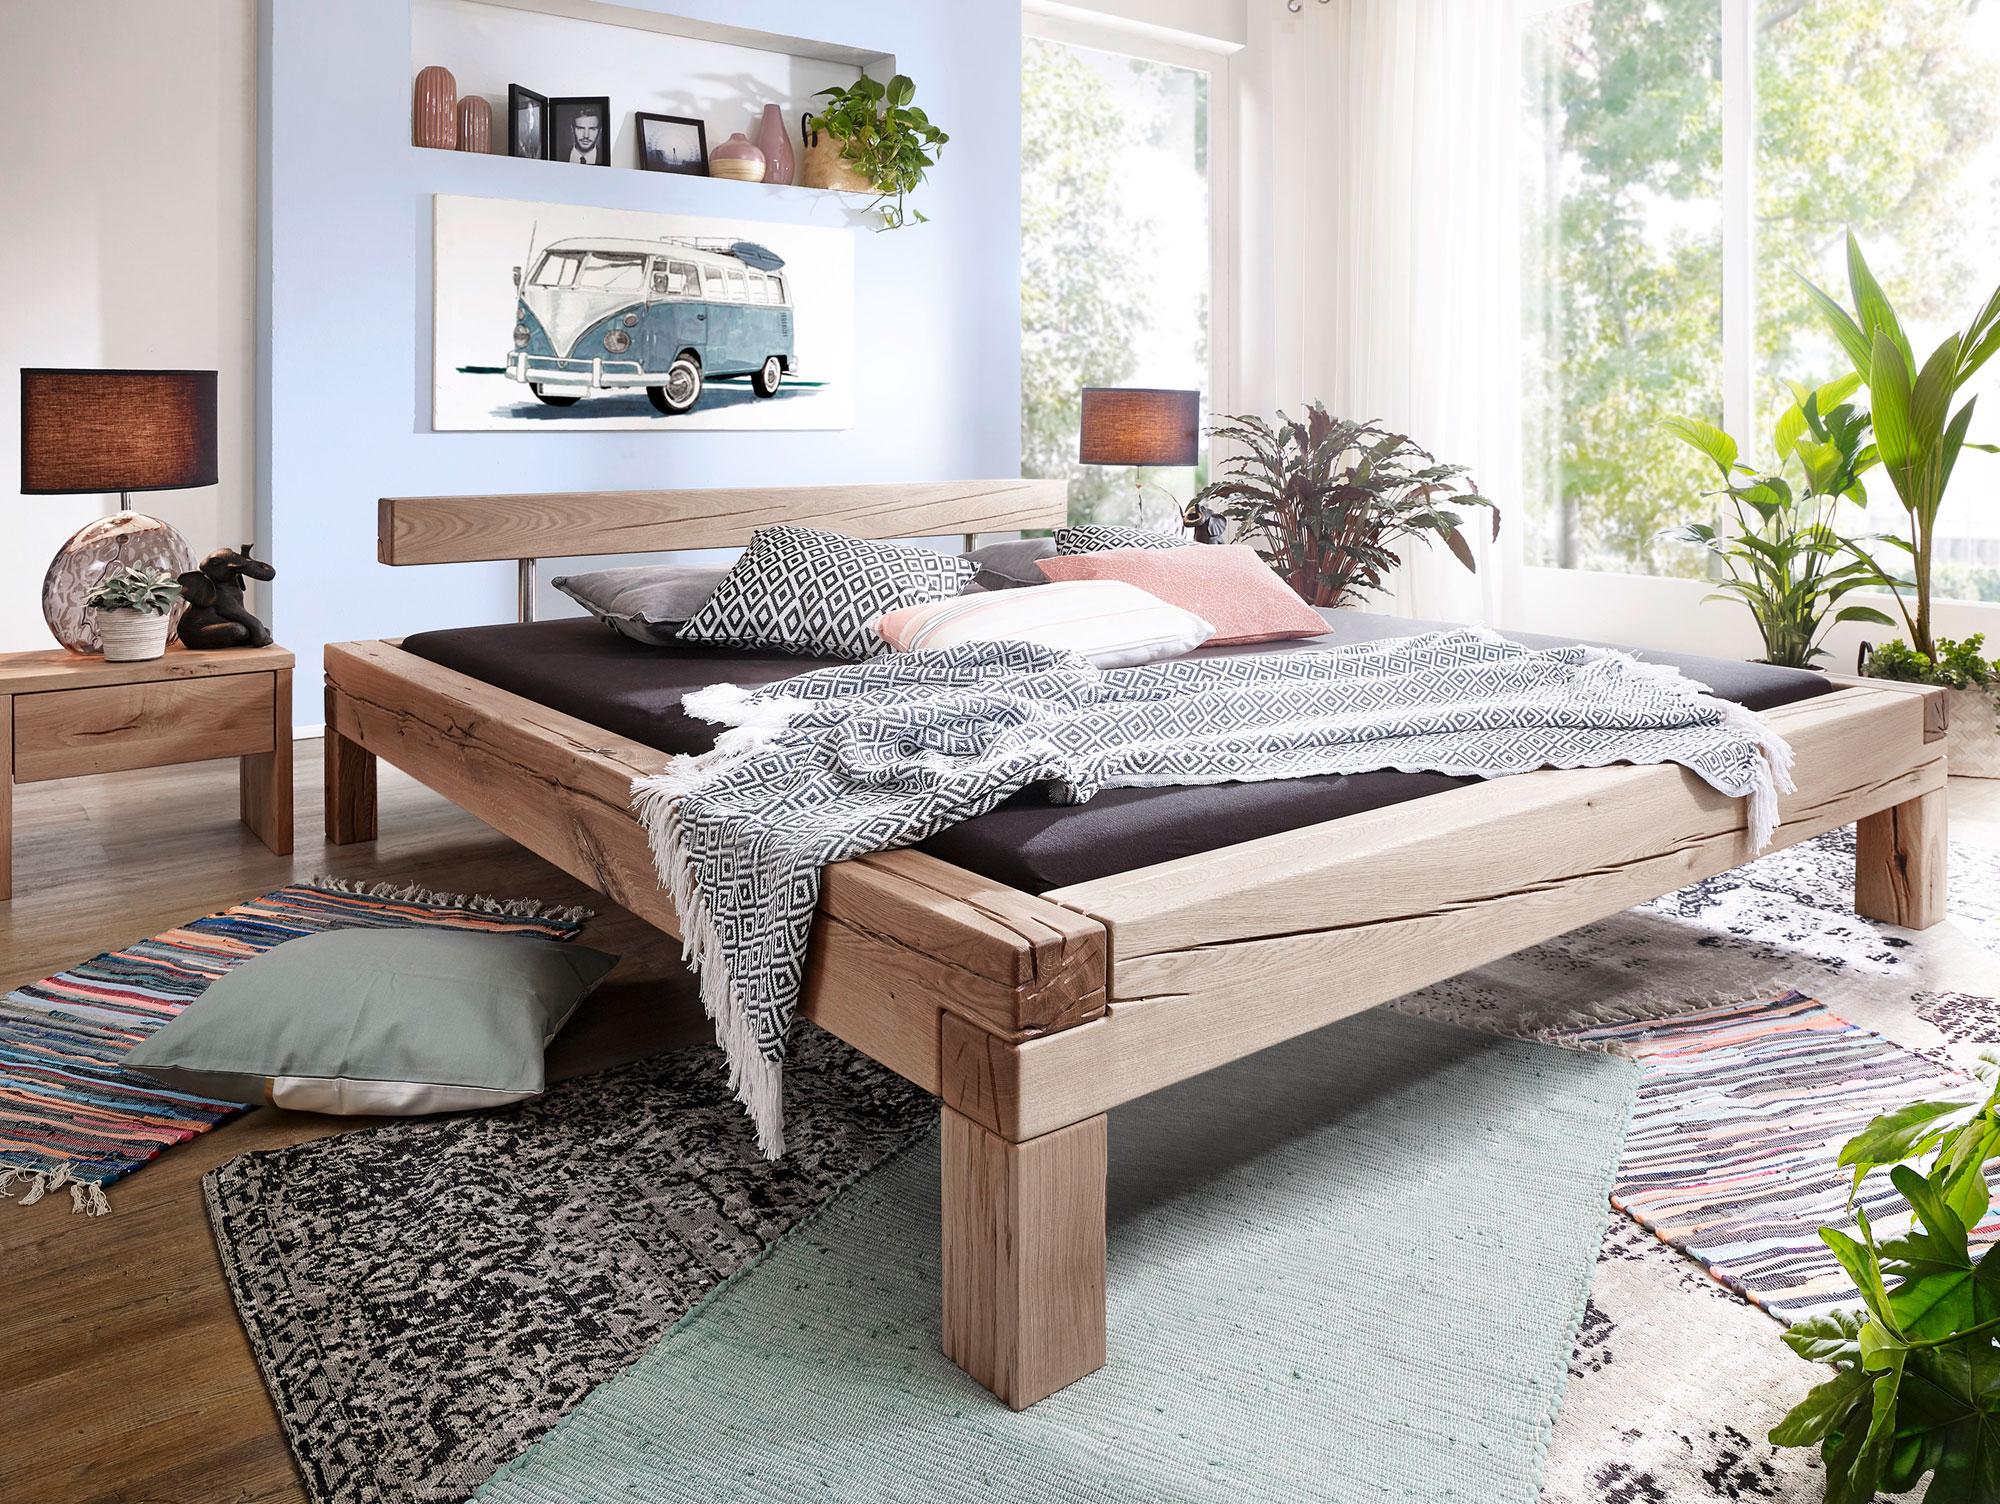 lukas massivholzbett 160 x 200 cm eiche hell. Black Bedroom Furniture Sets. Home Design Ideas